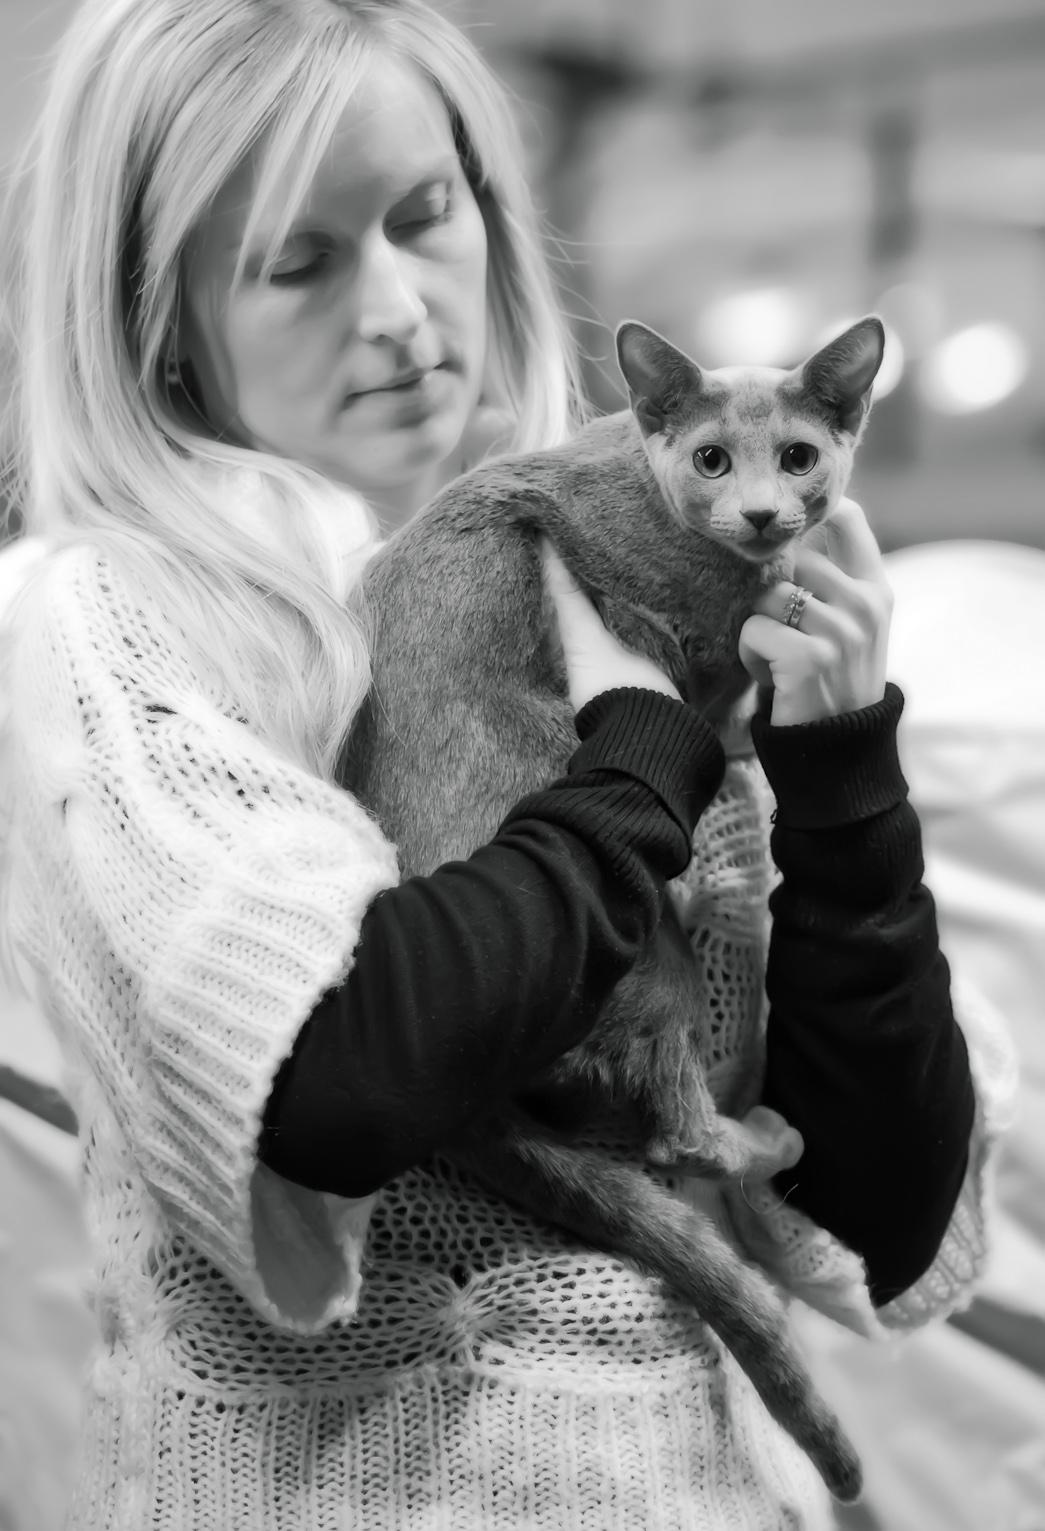 Shady-Lady's Fairlane [RUS], photo 202055, 2012-12-29